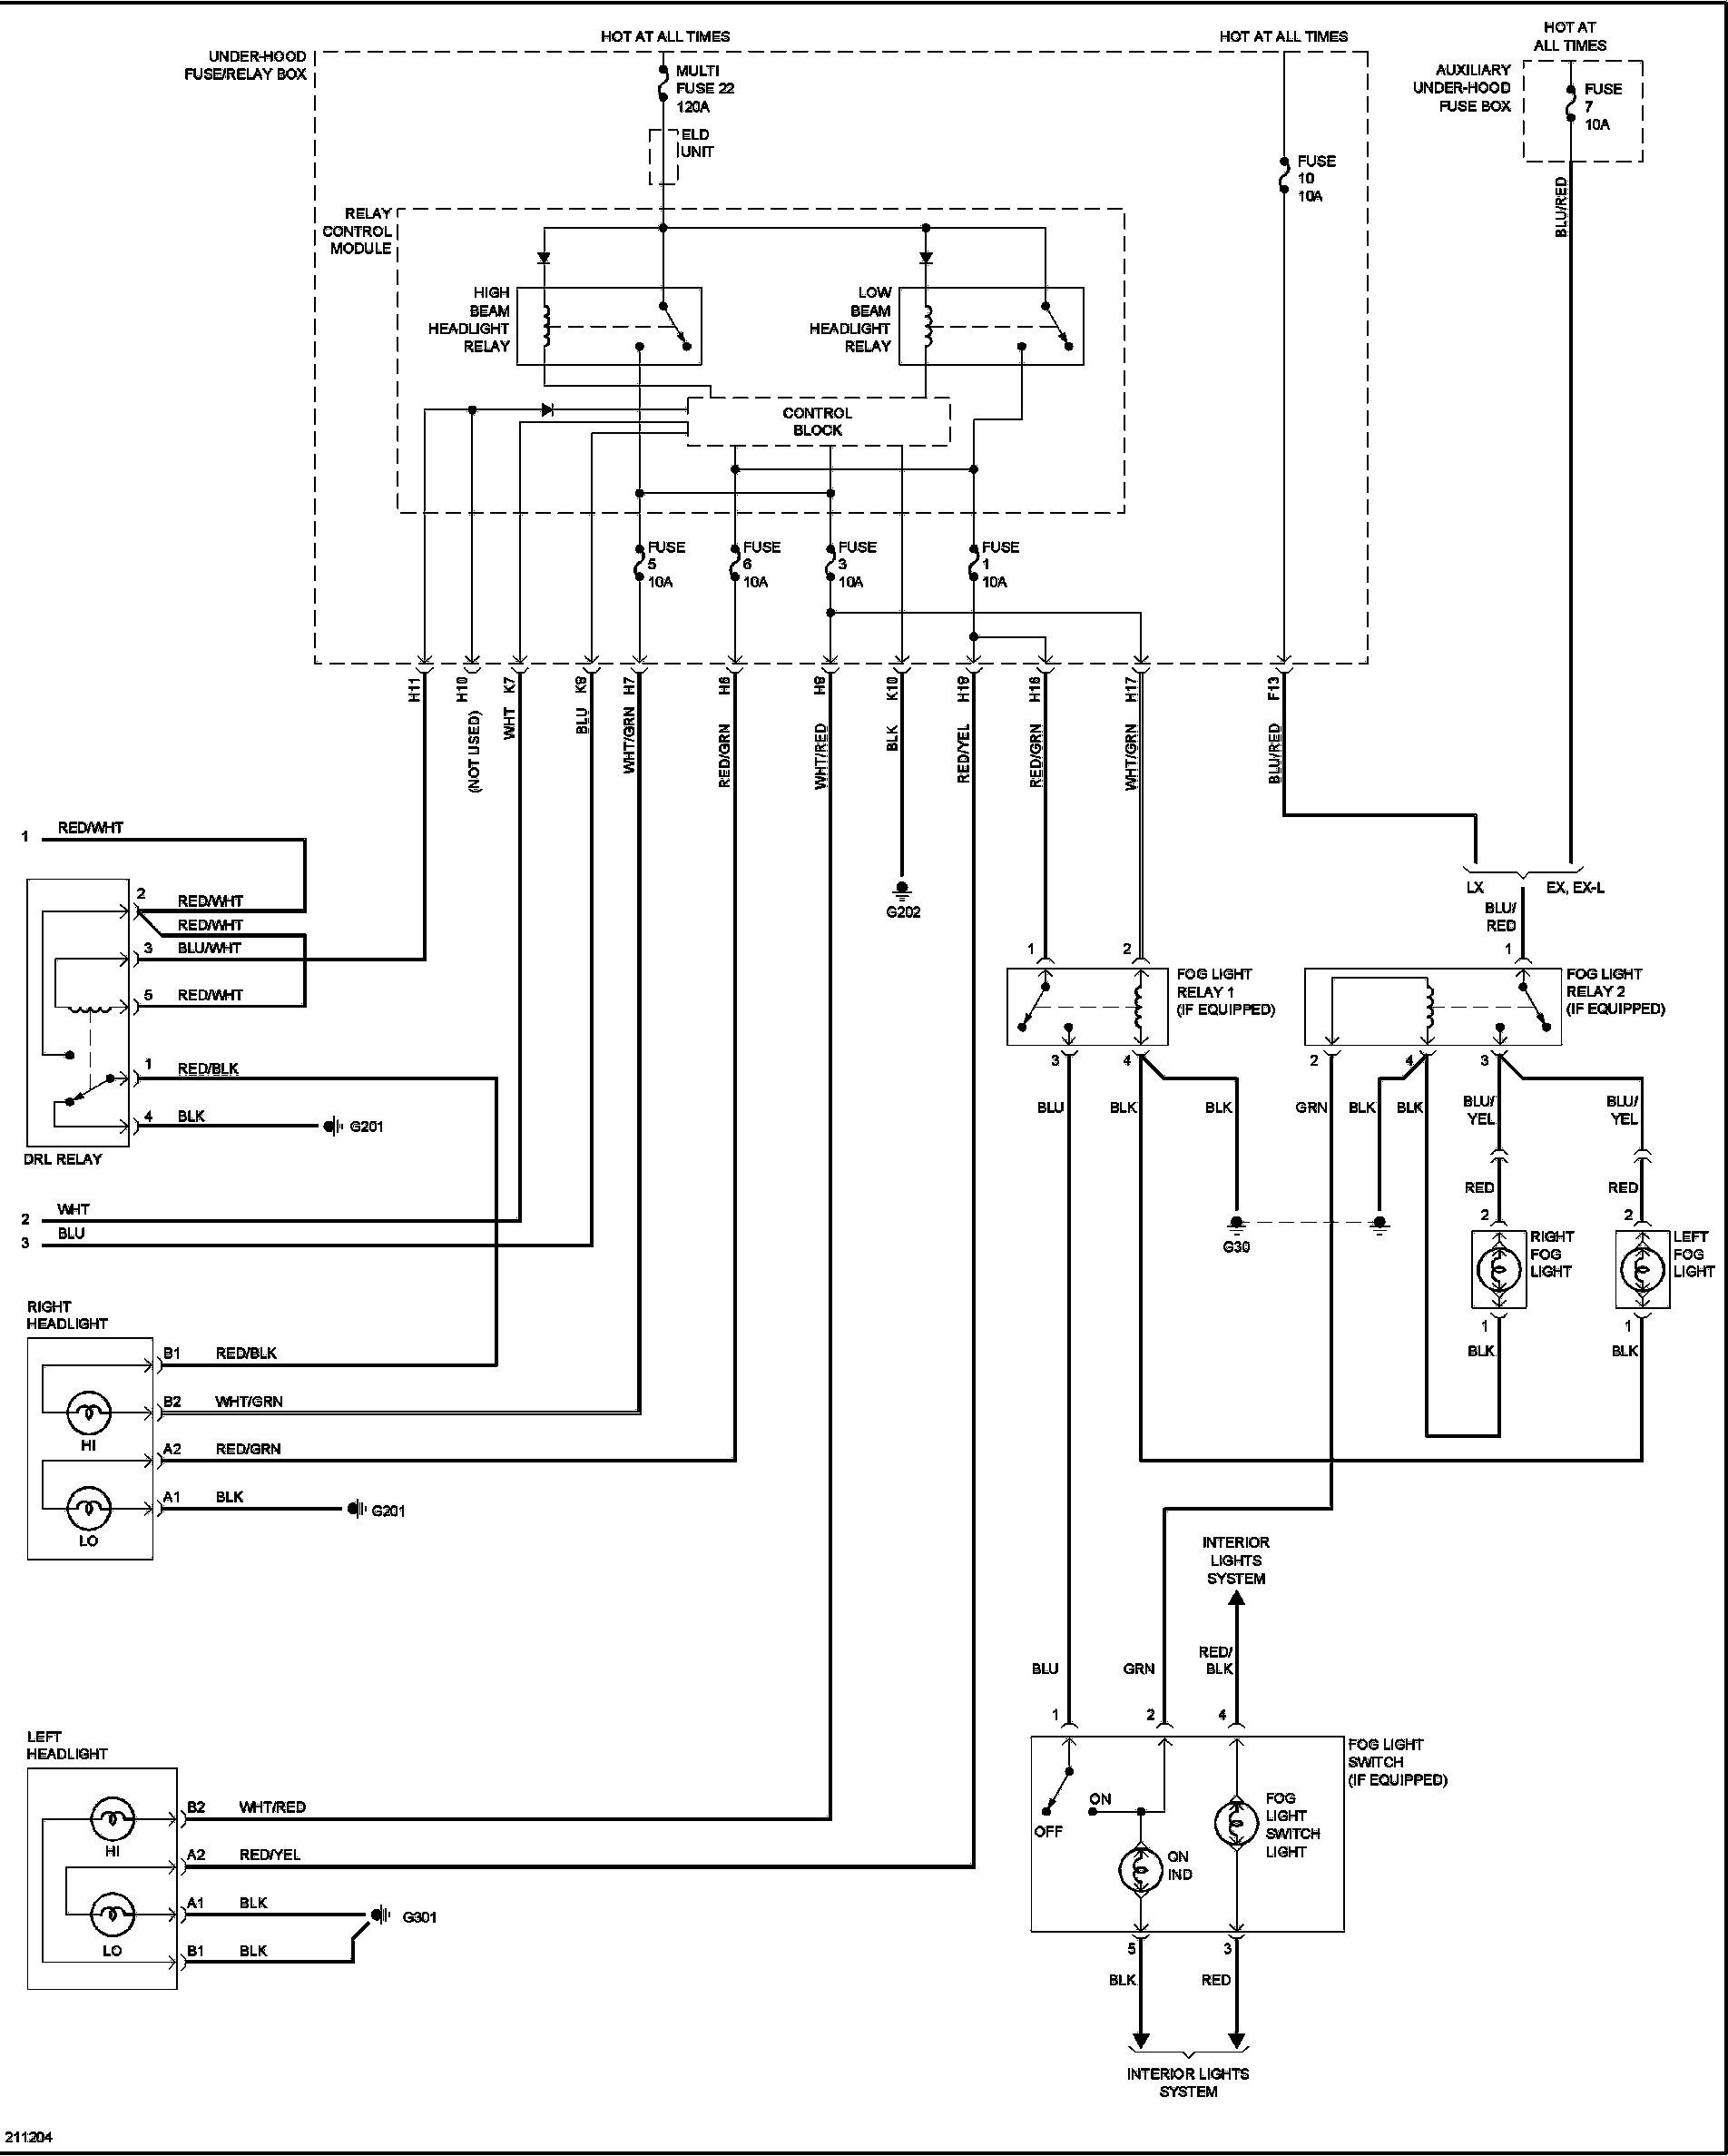 2000 Honda Civic Wiring Diagram 2000 Honda Civic Ac Wiring Trusted Wiring Diagrams • Of 2000 Honda Civic Wiring Diagram